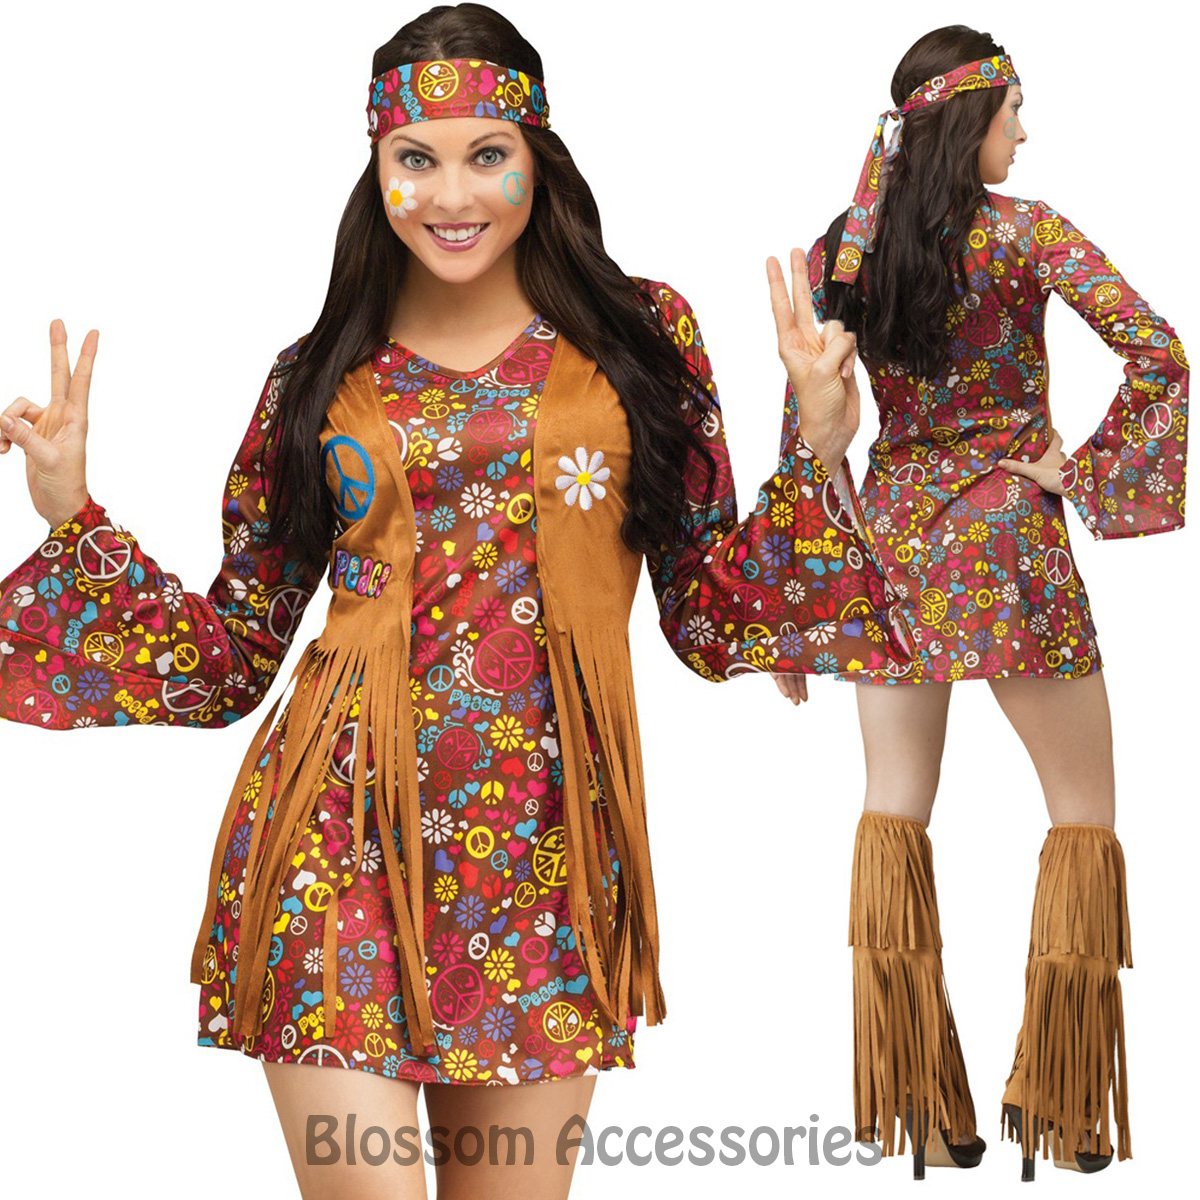 K168-60s-70s-Peace-Retro-Hippie-Dancing-Groovy-Hippy-Disco-Fancy-Dress-Costume